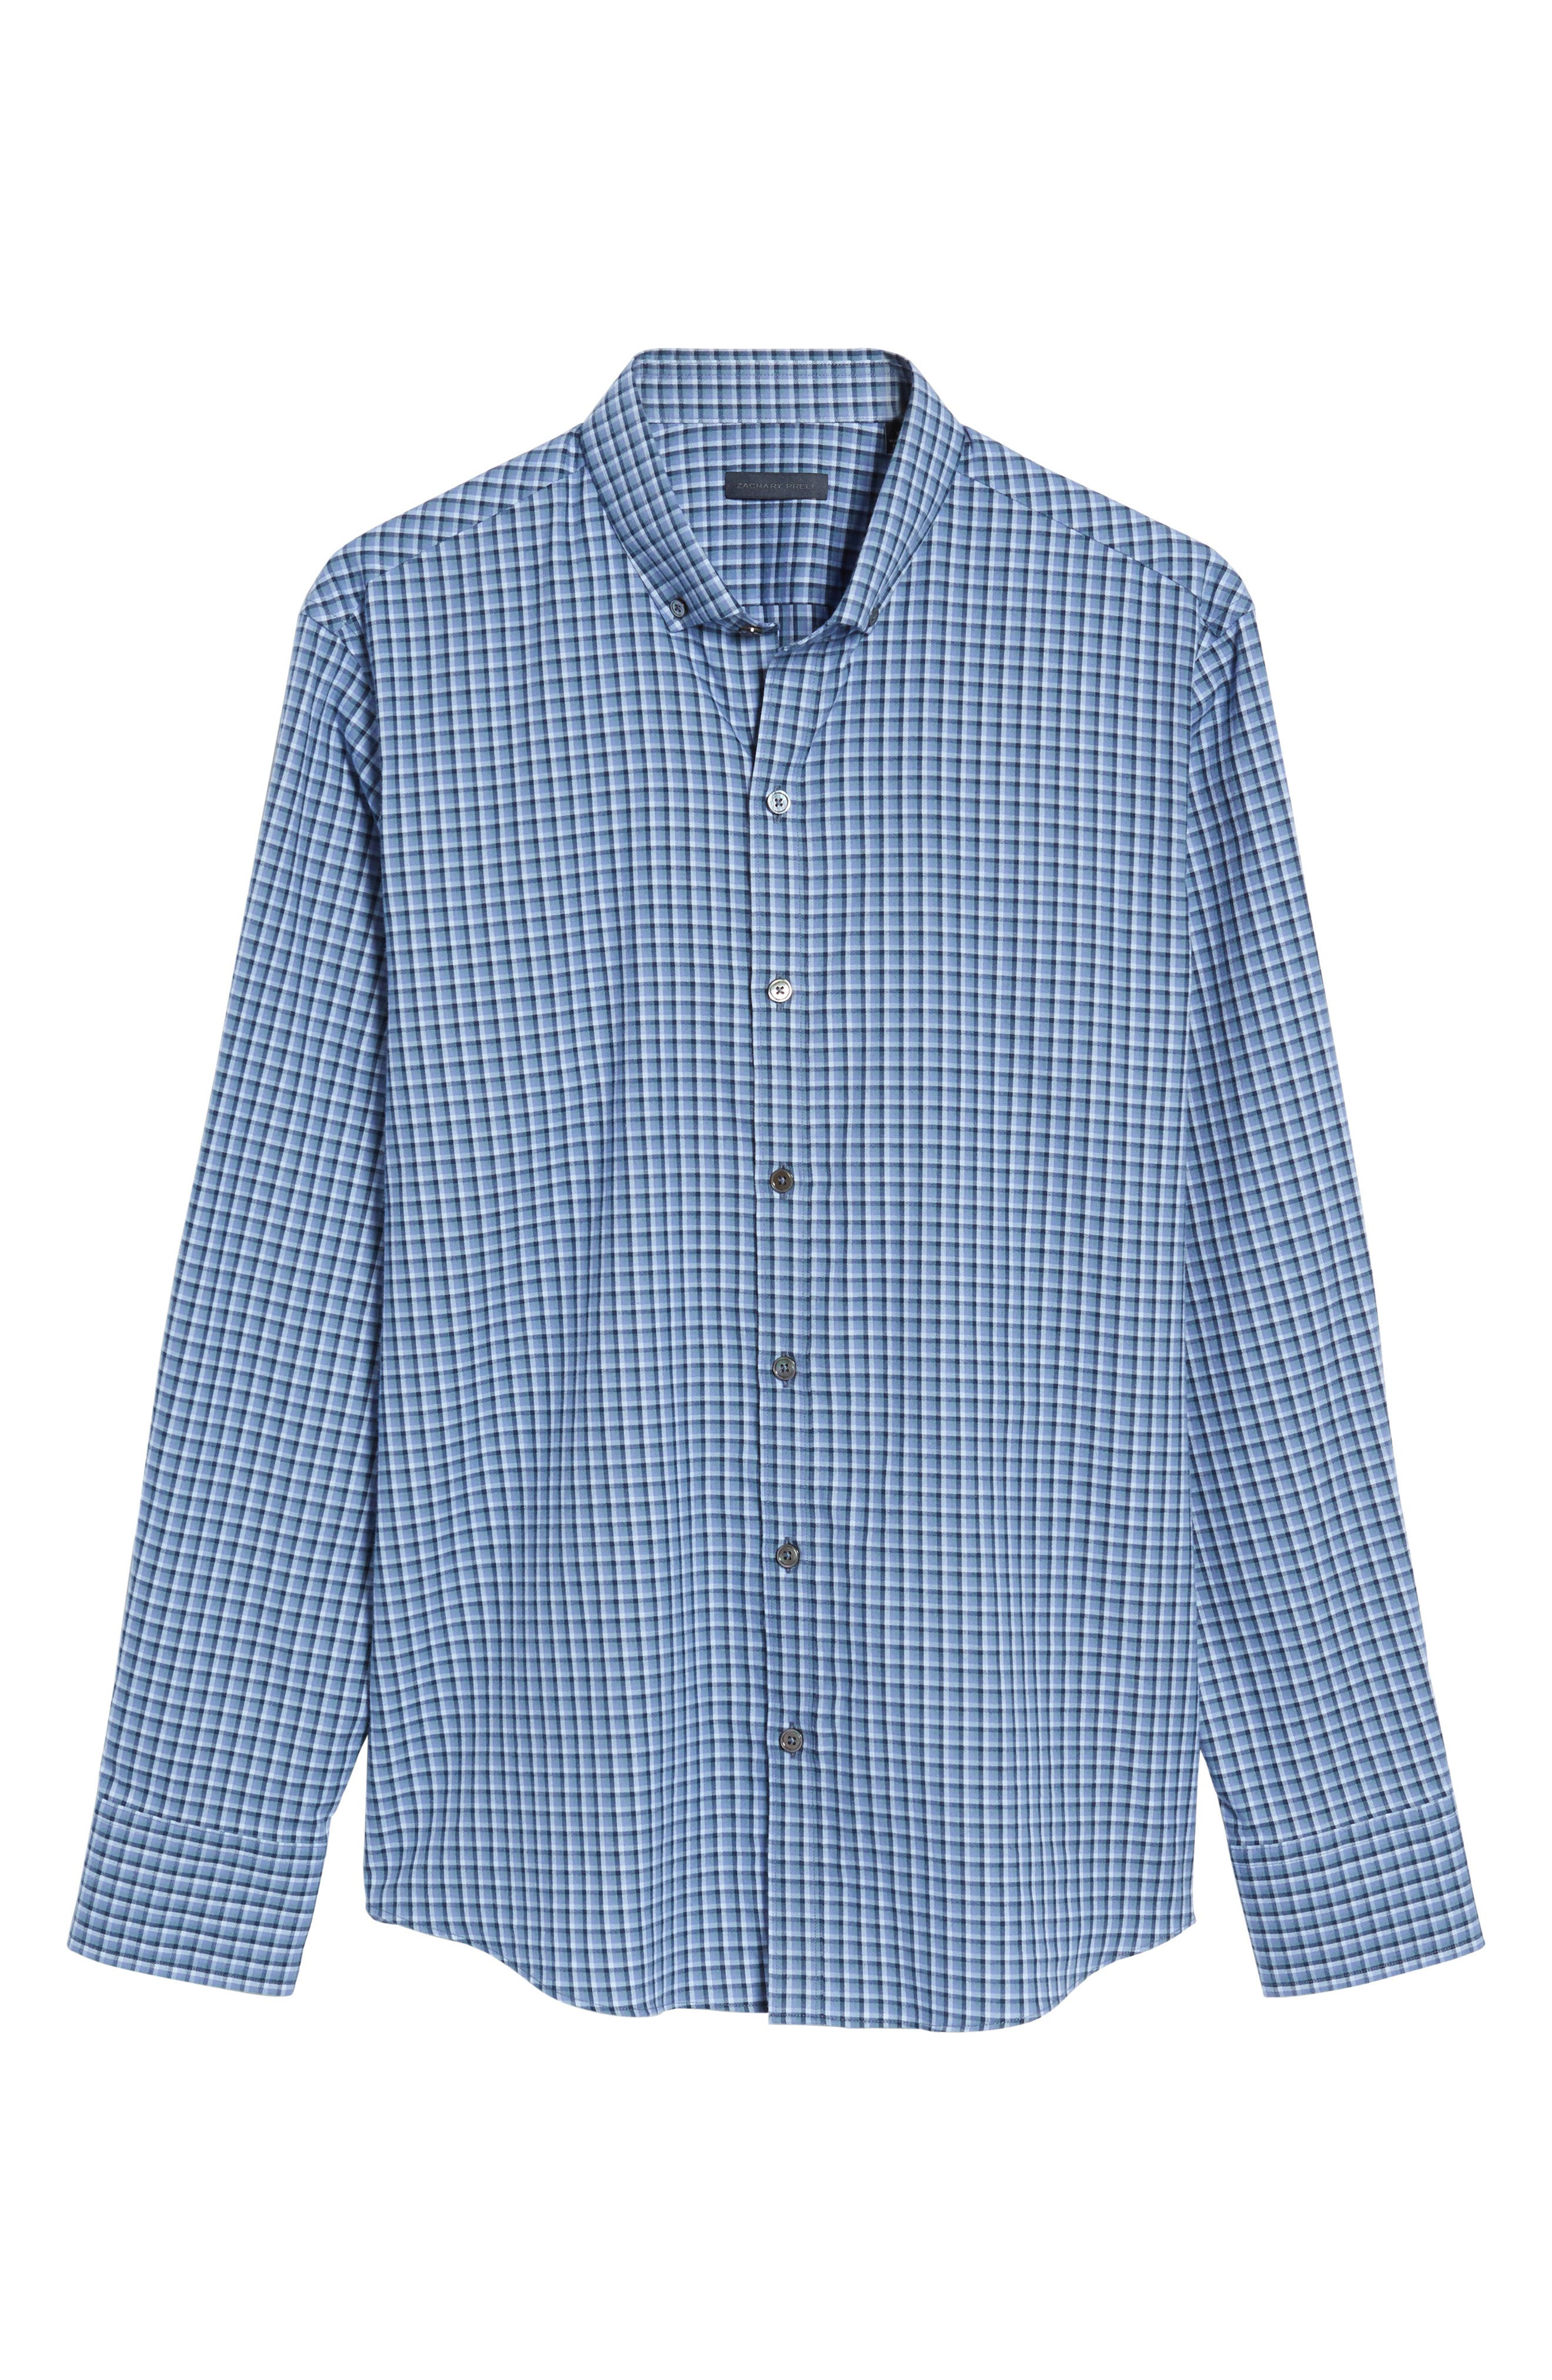 Kapur Slim Fit Check Sport Shirt,                             Alternate thumbnail 6, color,                             Azure